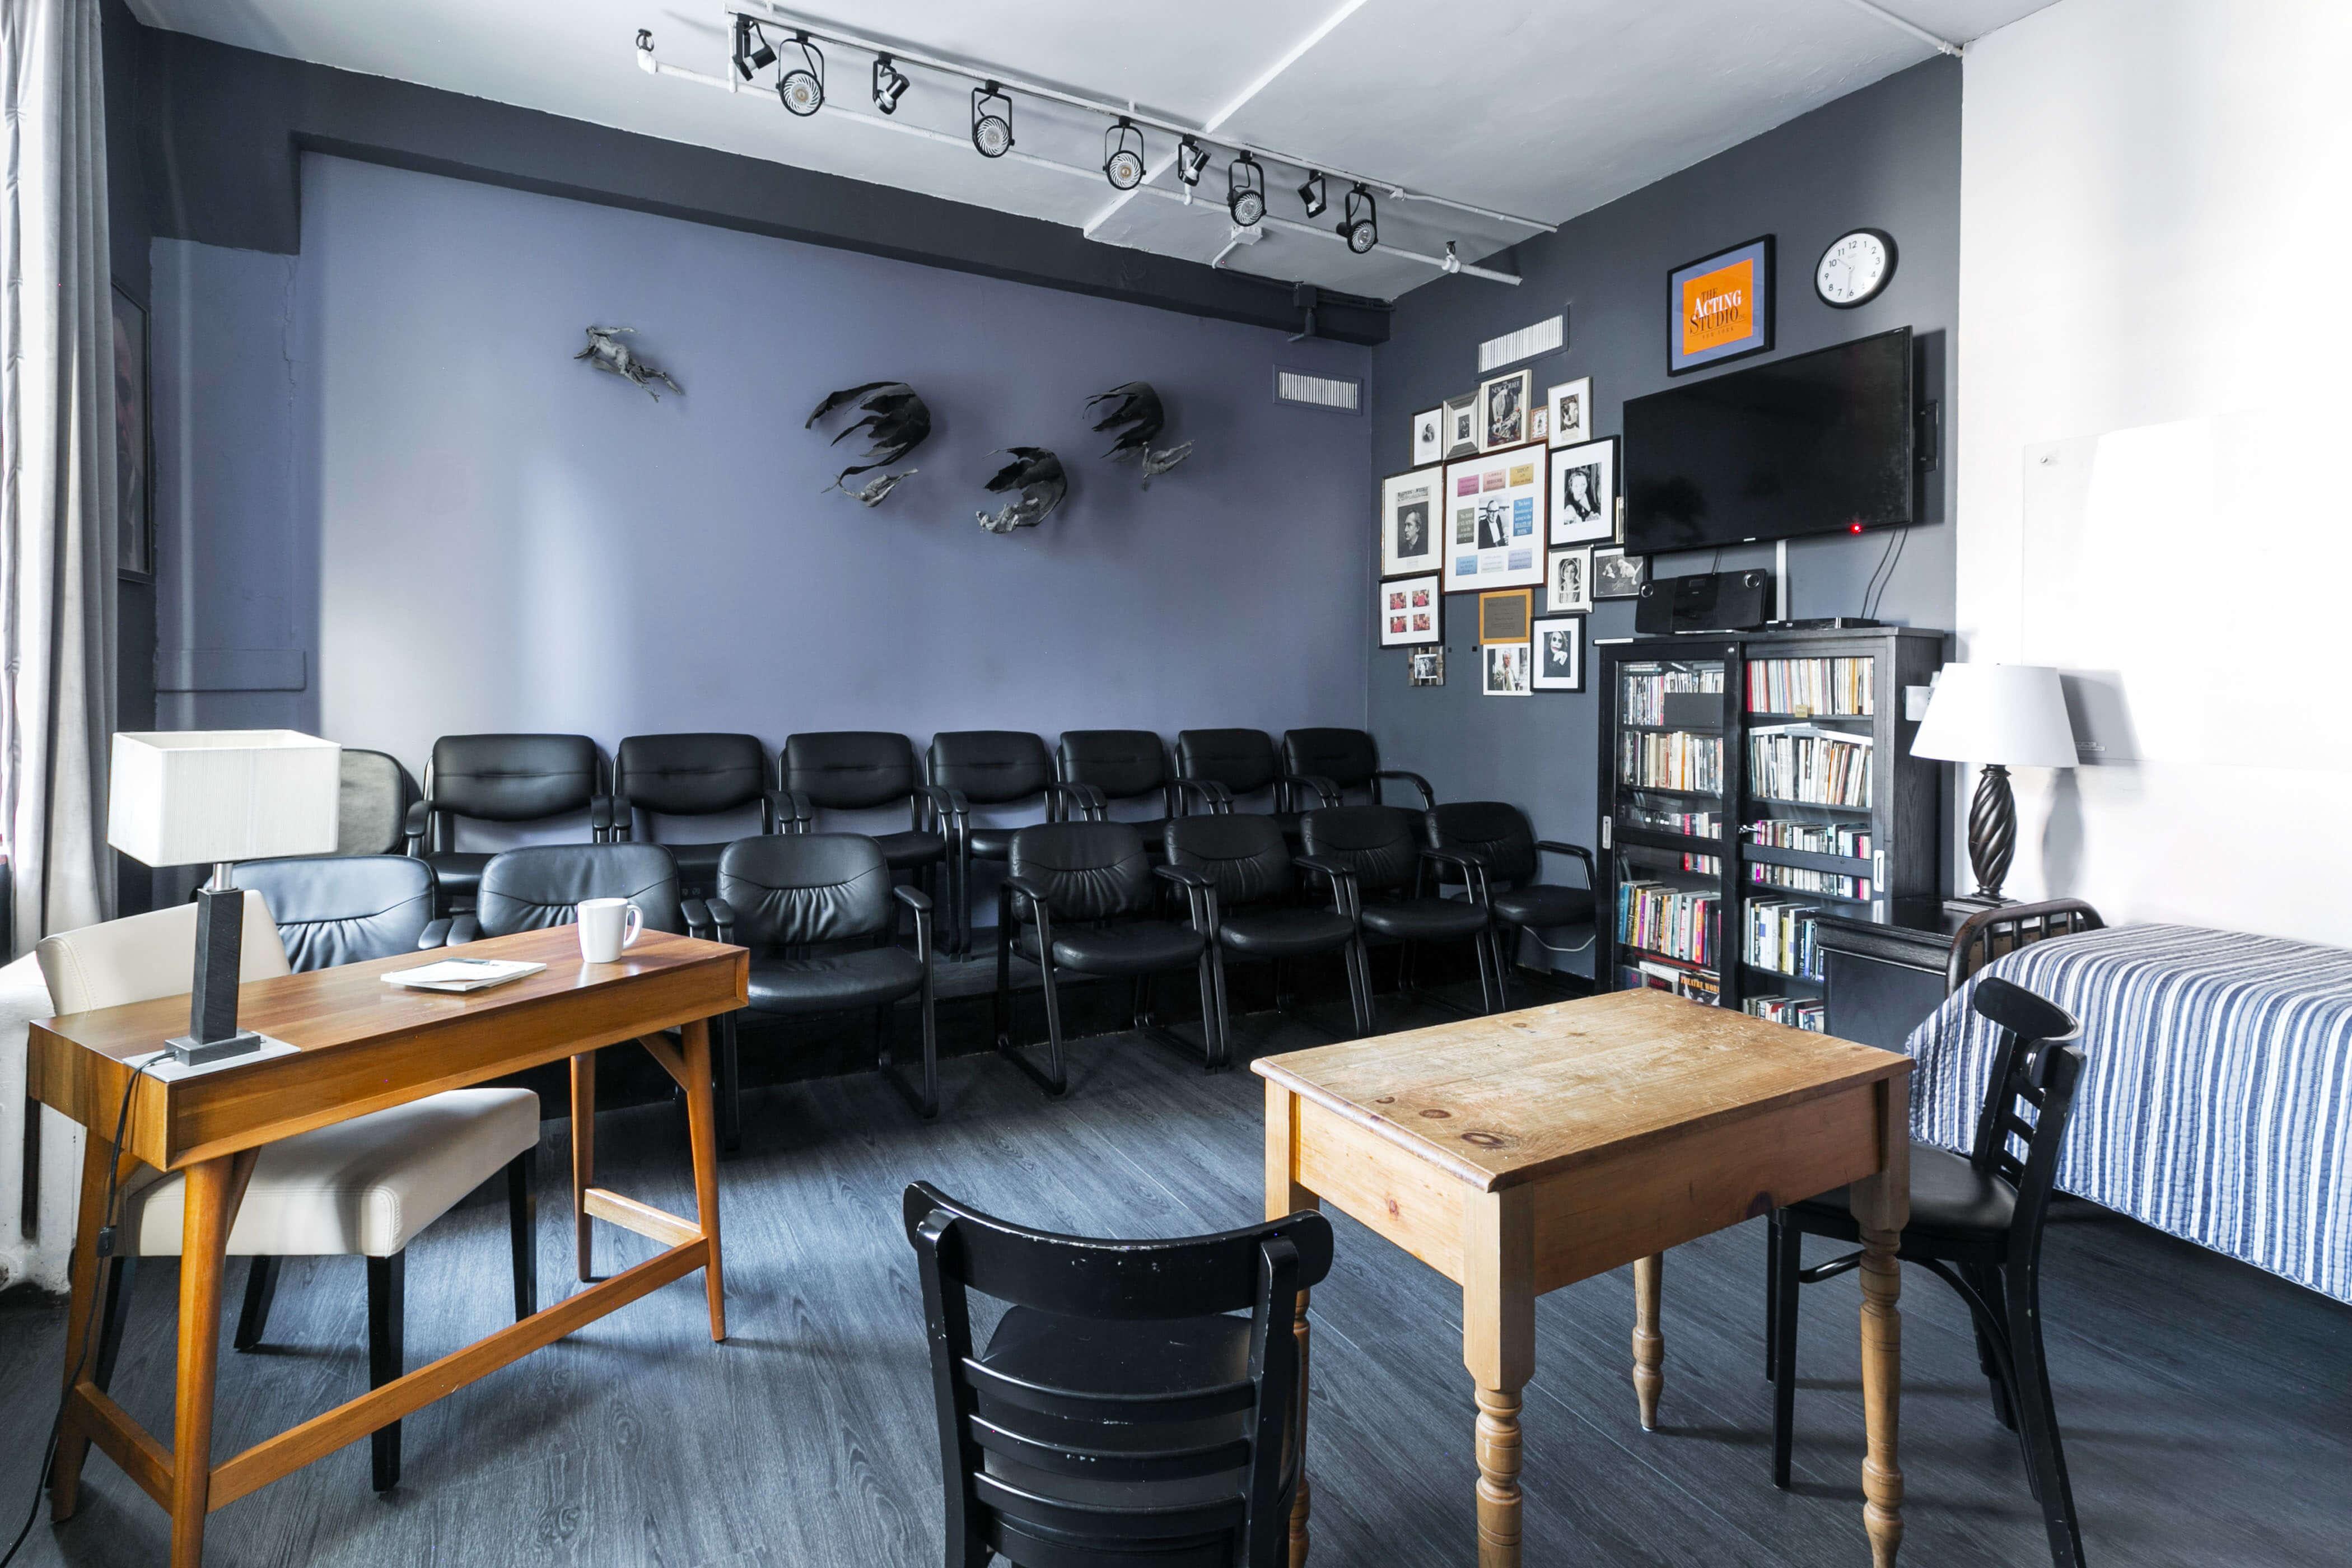 Nyc Acting Classes Facilities The Acting Studio New York Llc